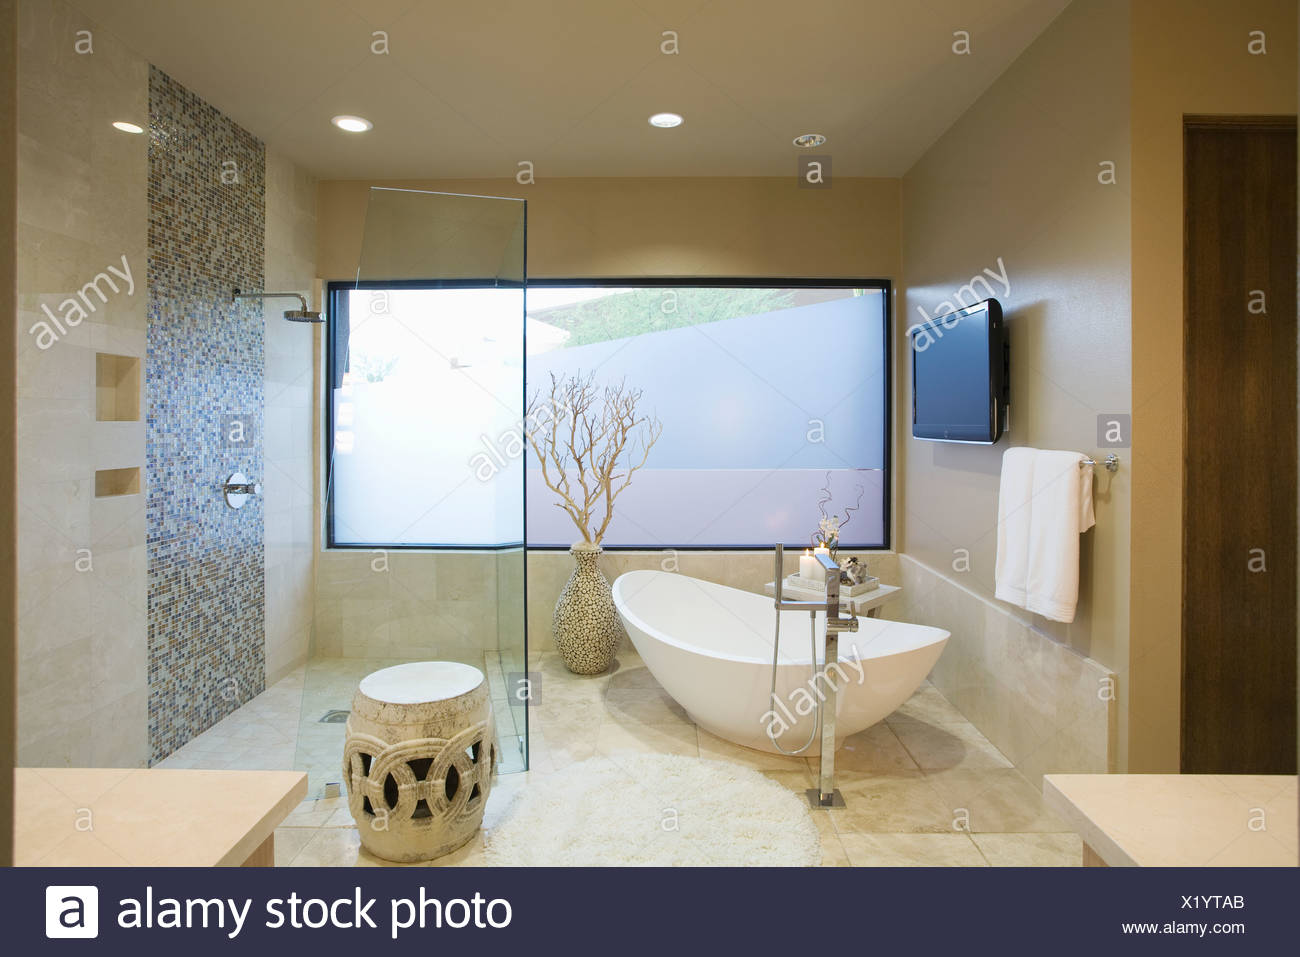 Bathroom Stool Stock Photos & Bathroom Stool Stock Images - Alamy